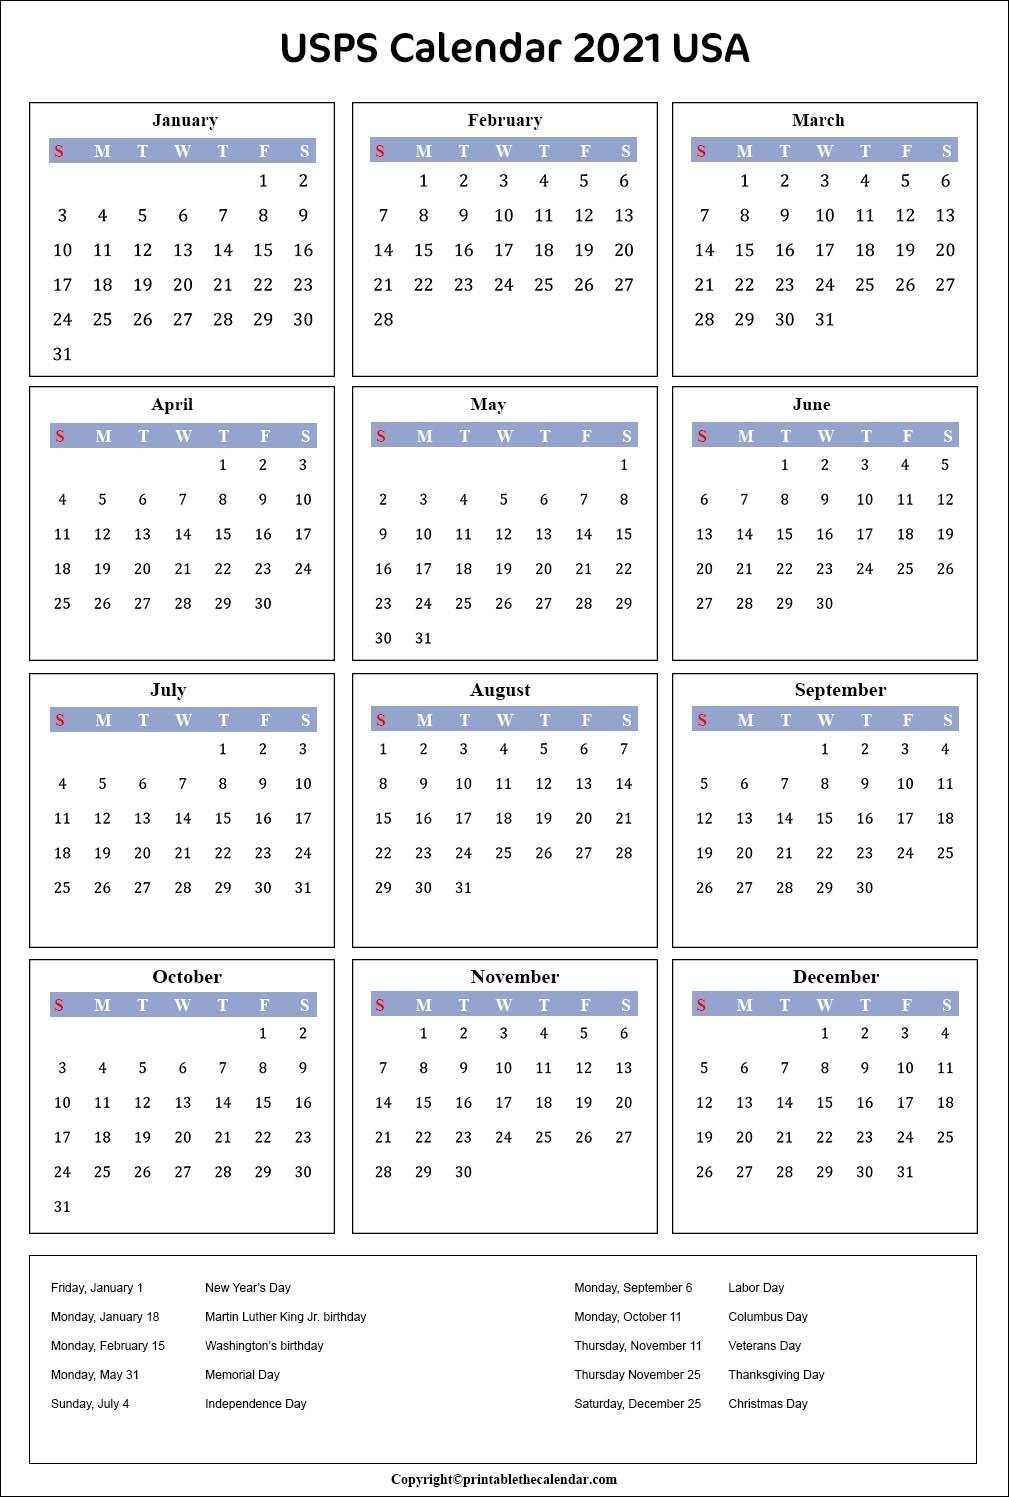 Usps Holidays 2021 Calendar - January 2021